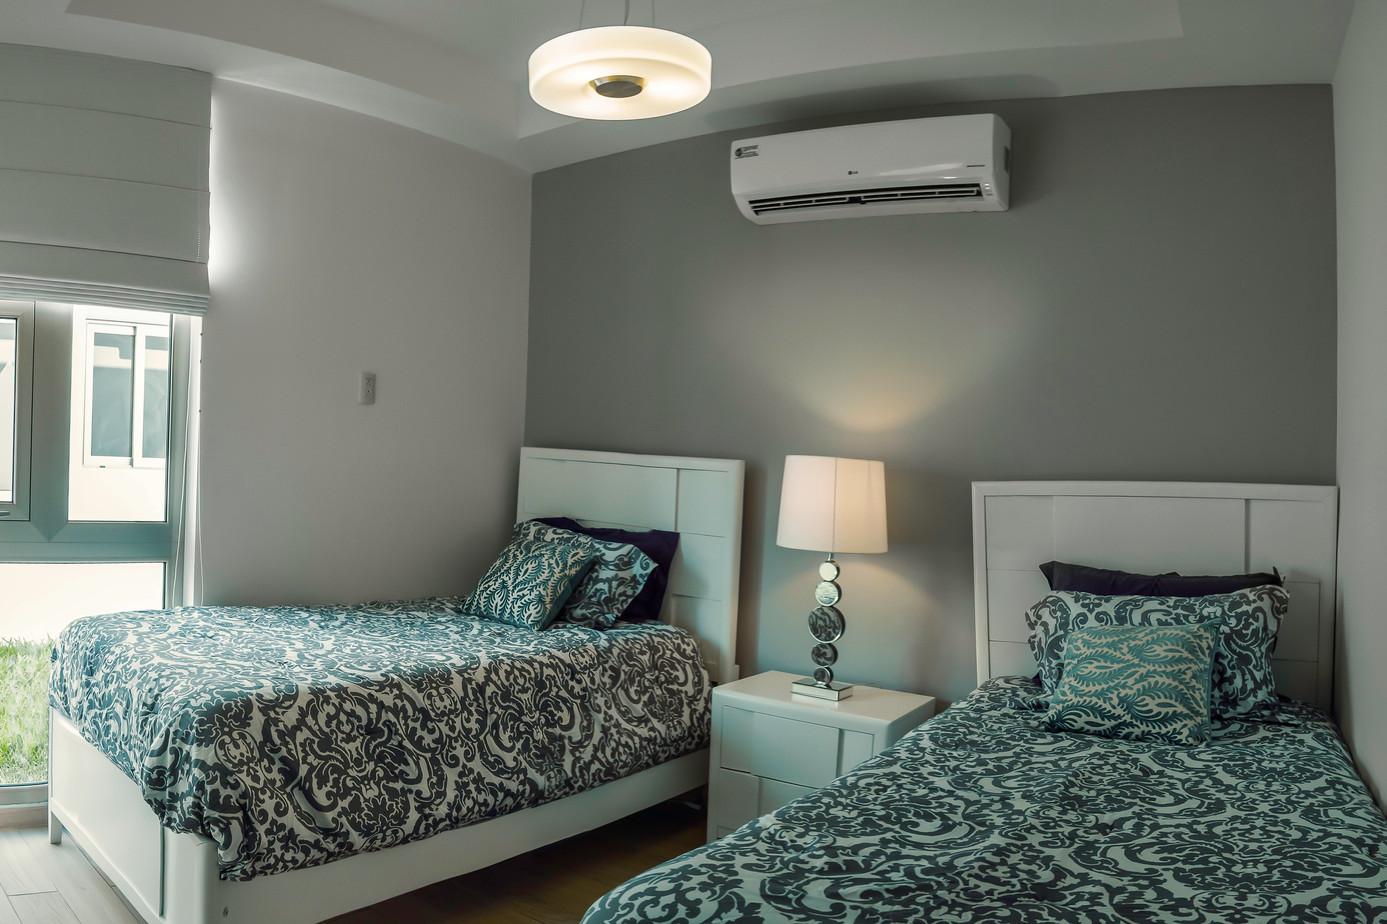 08+dormitorio+dos+camas.jpeg